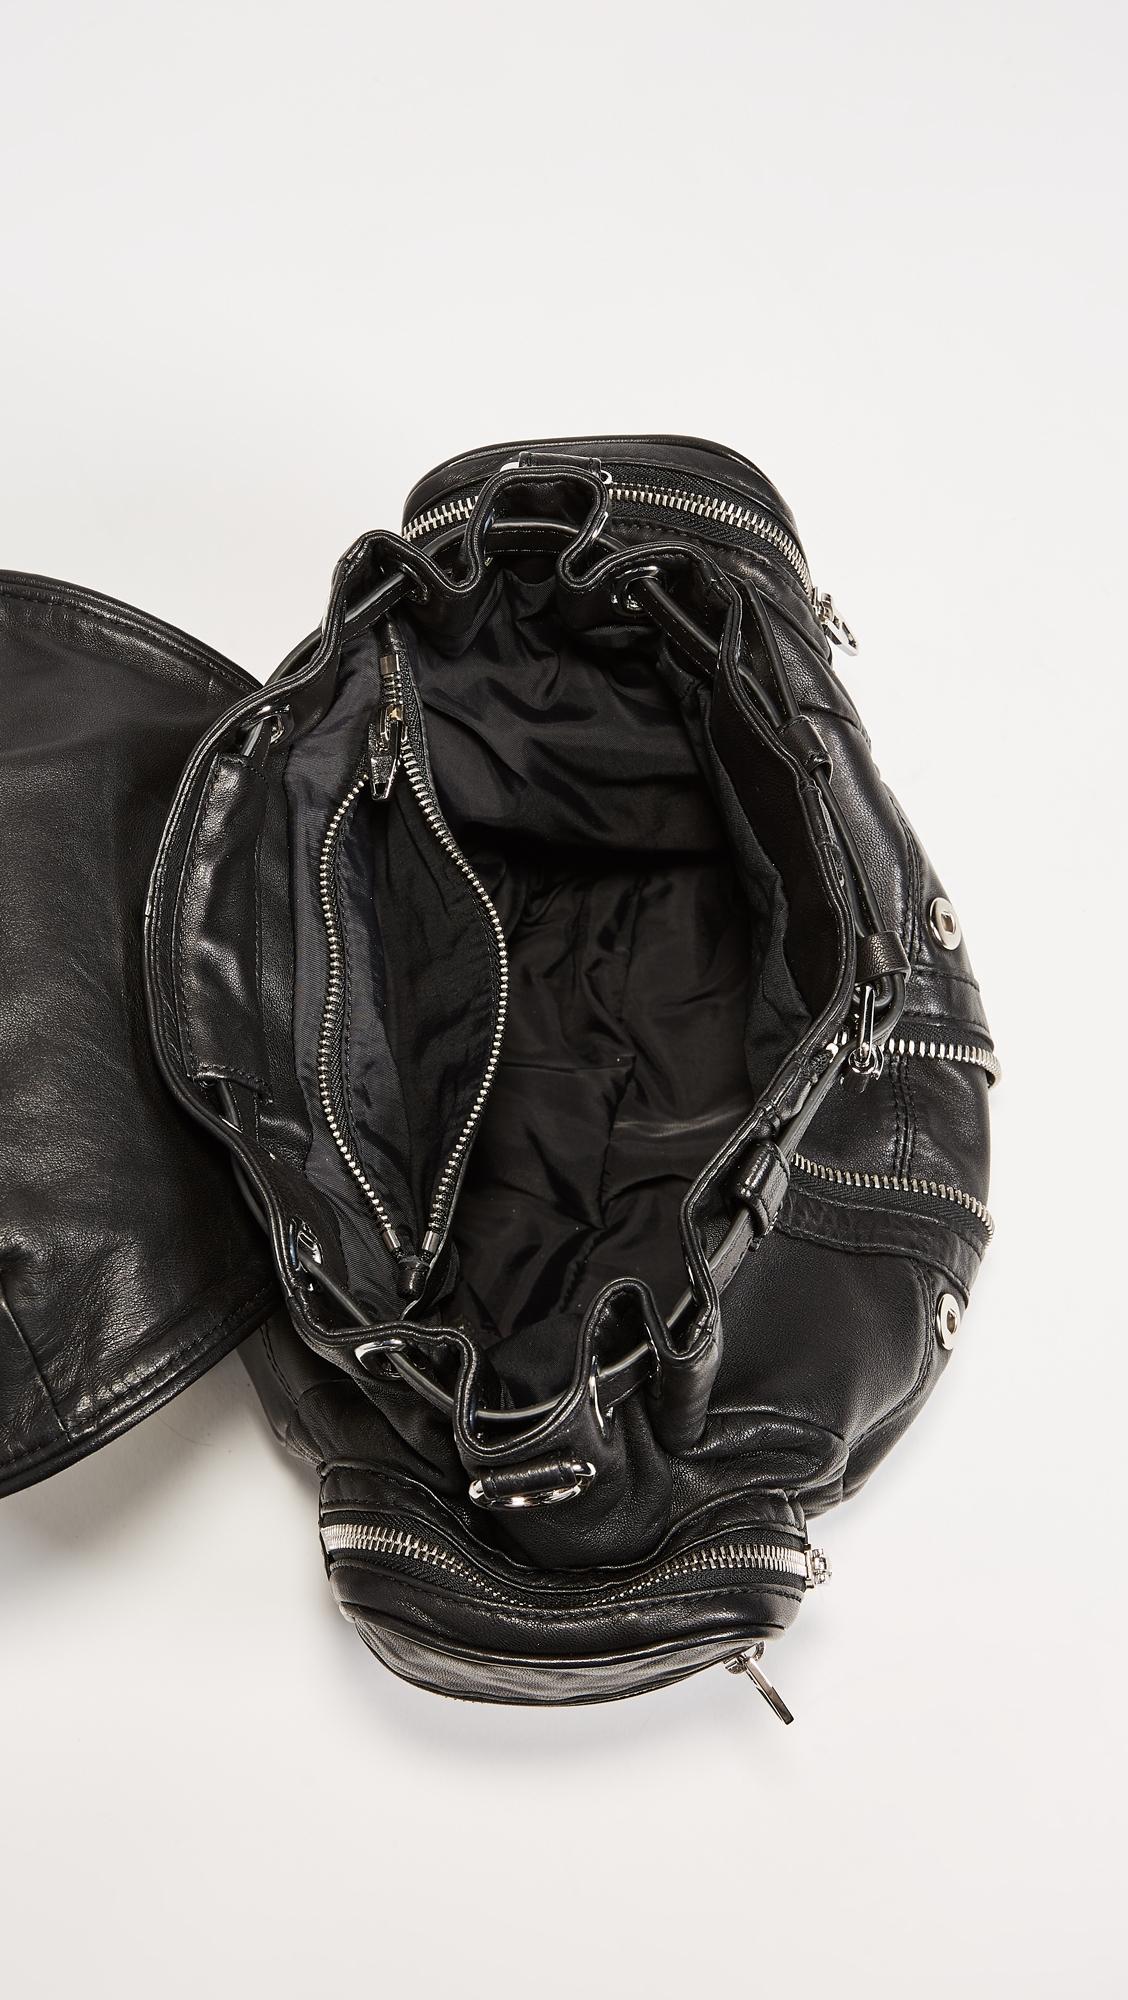 Миниатюрный рюкзак Marti Alexander Wang  (AWANG4163712867314)